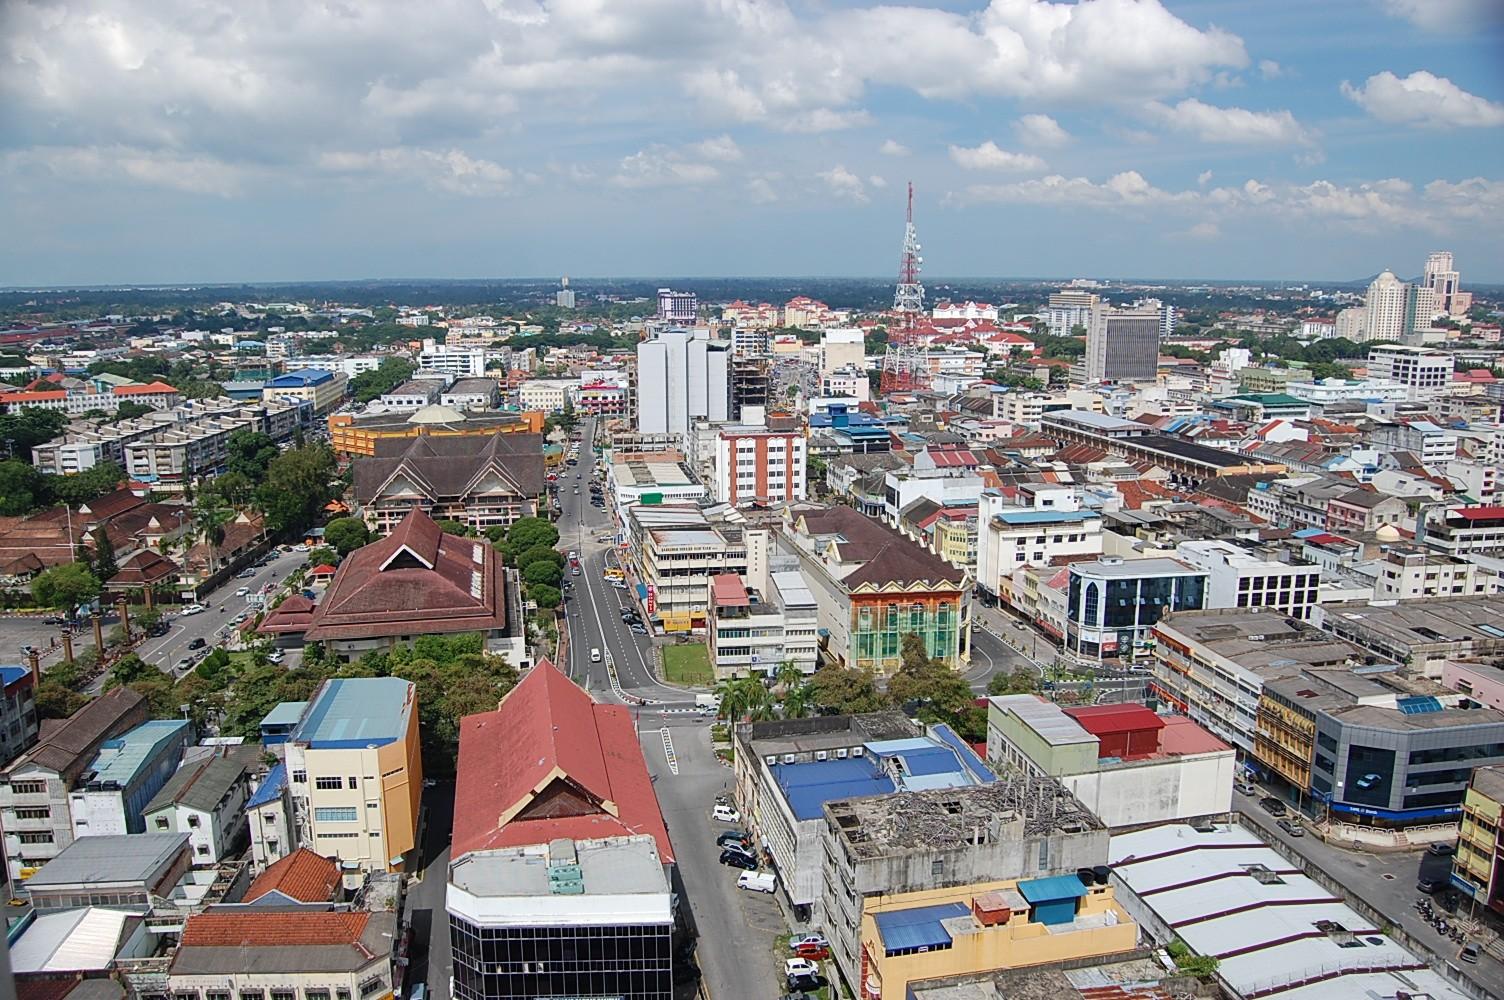 kota bharu attractions